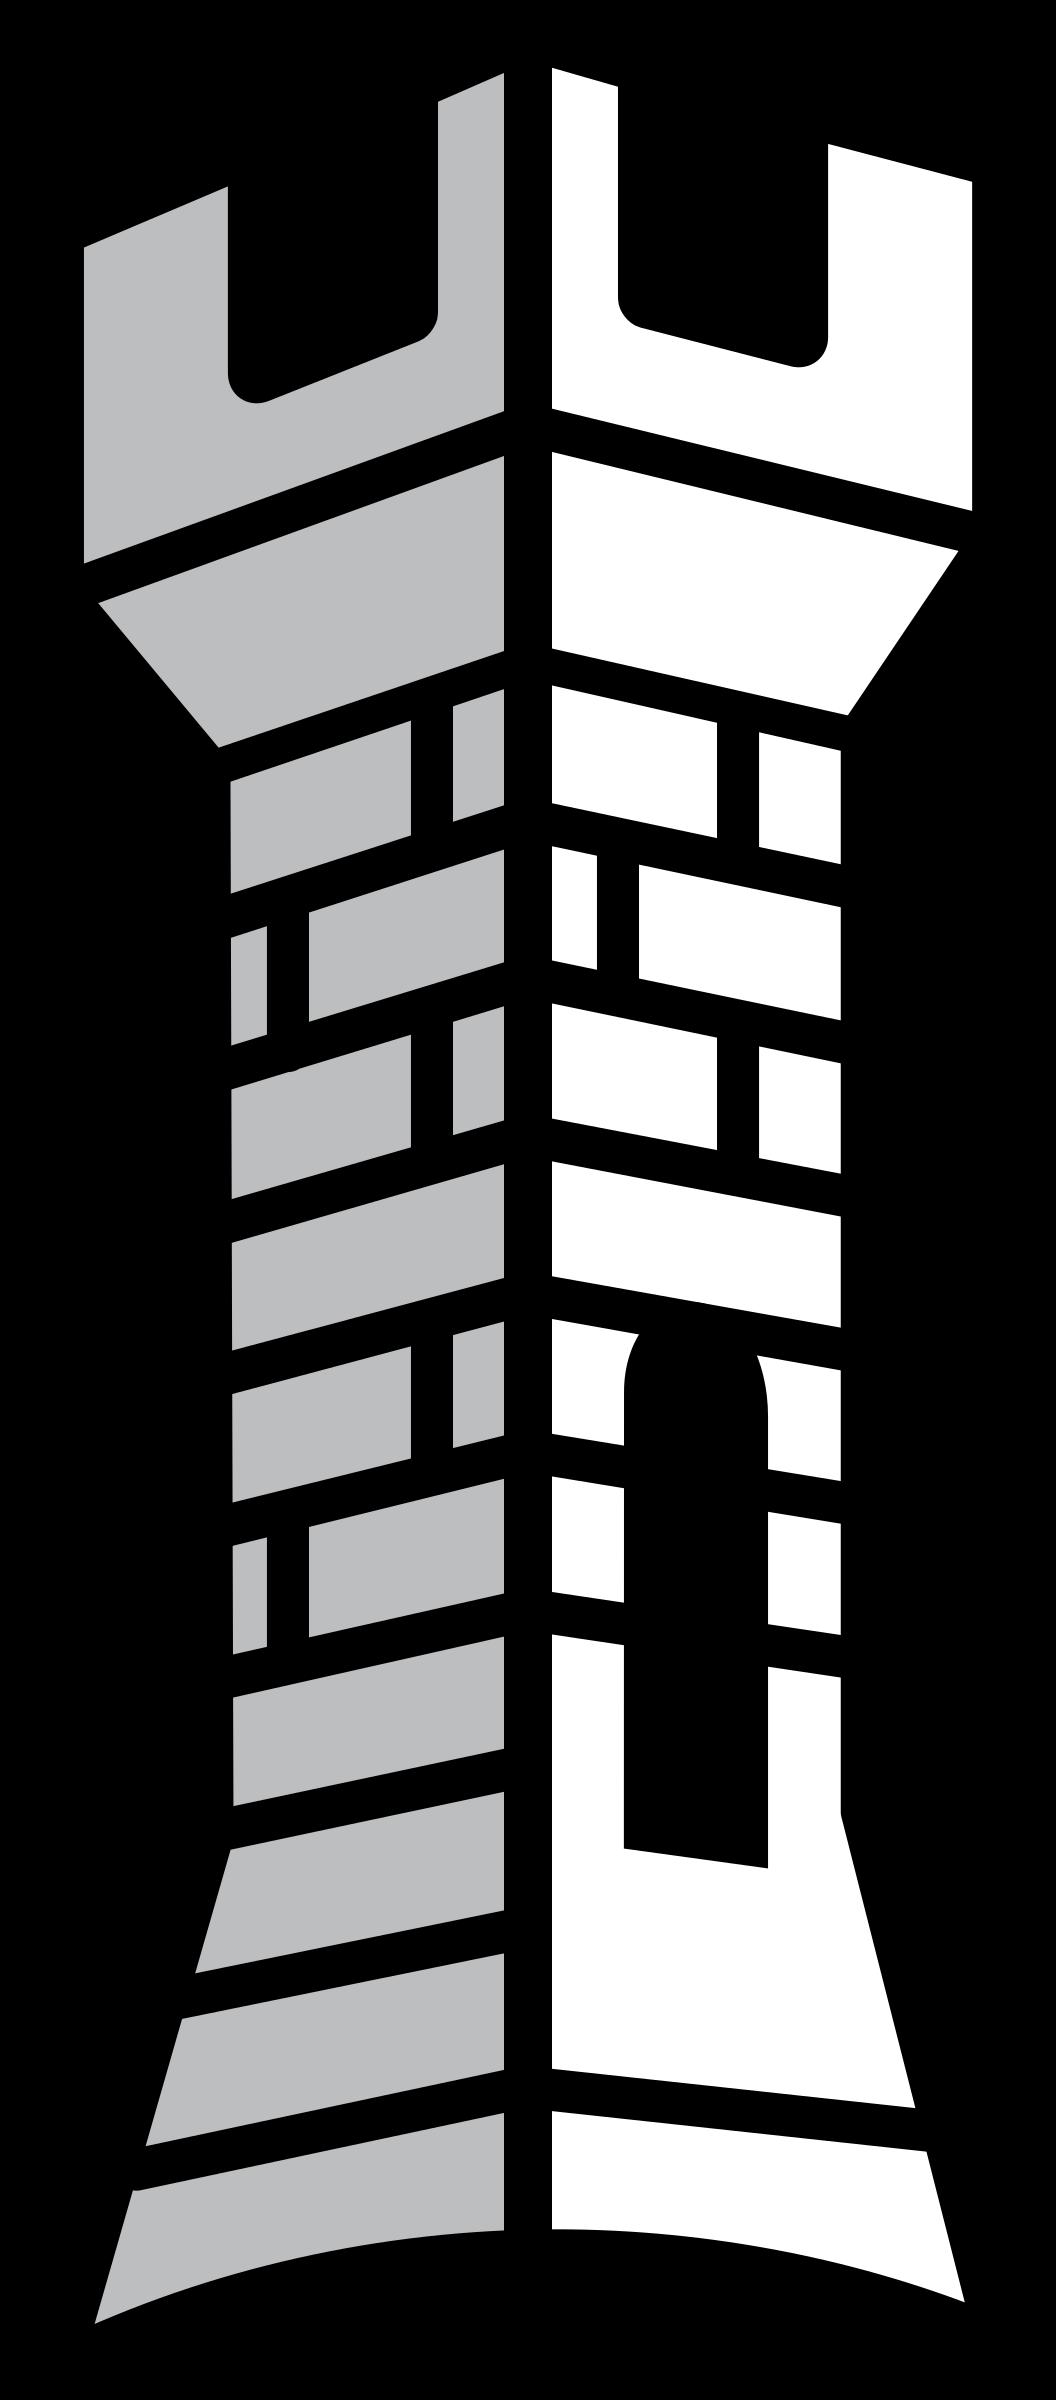 Big image png. Tower clipart coat arm